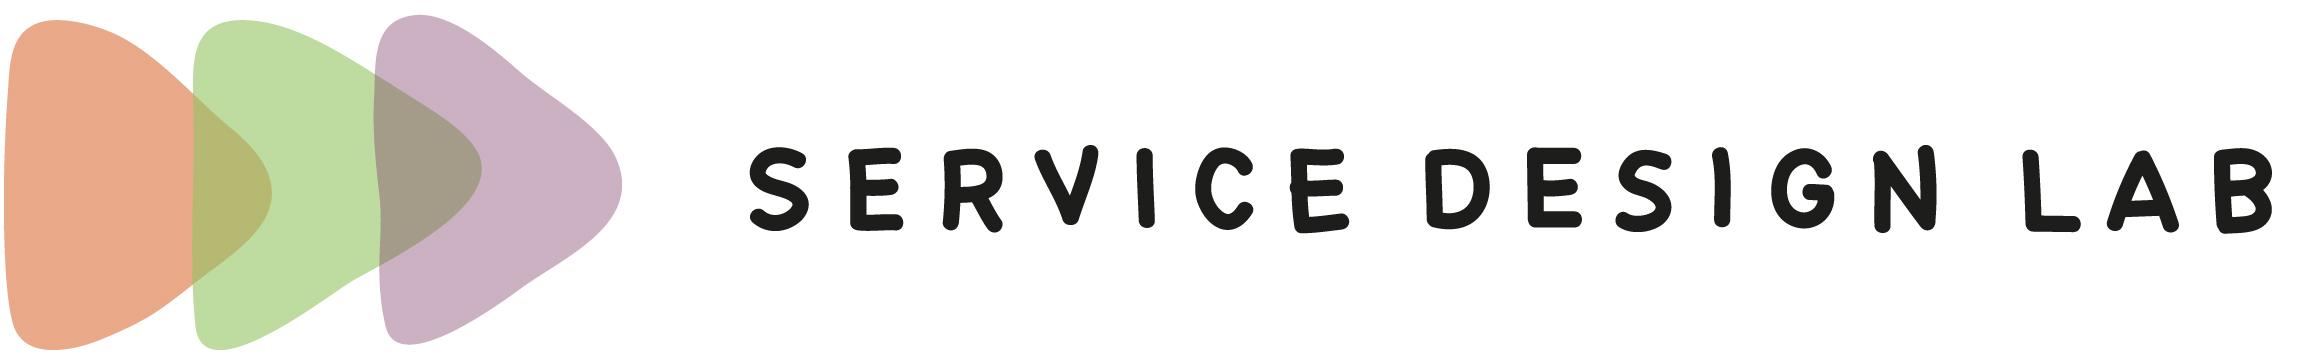 Service Design Lab